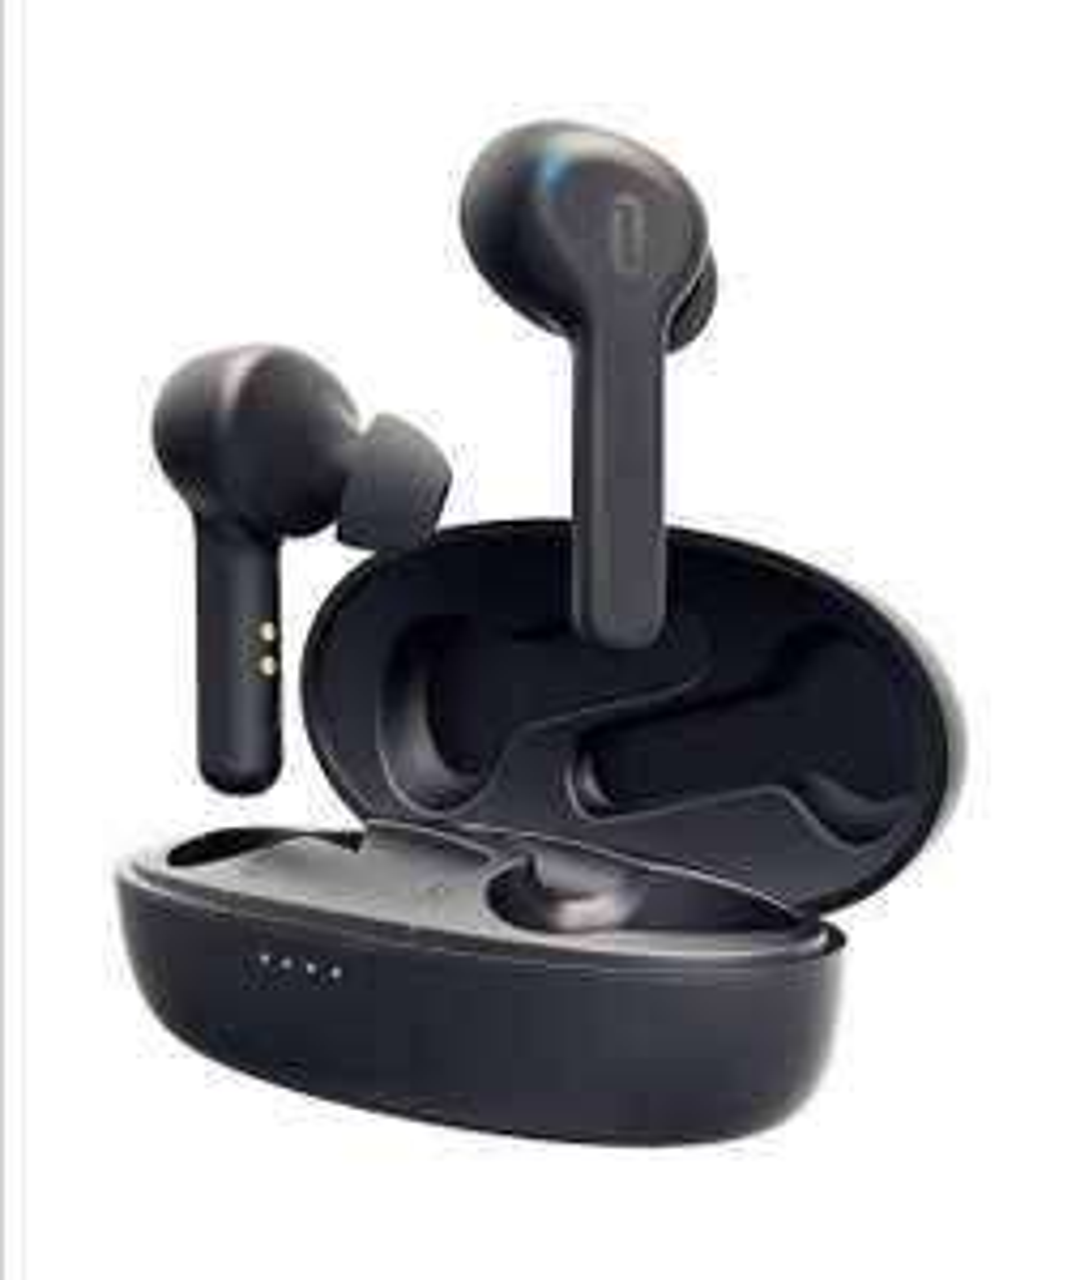 TaoTronics True Wireless Bluetooth 5.0 TWS Earphones - Case for Charging £22.33 @ Amazon